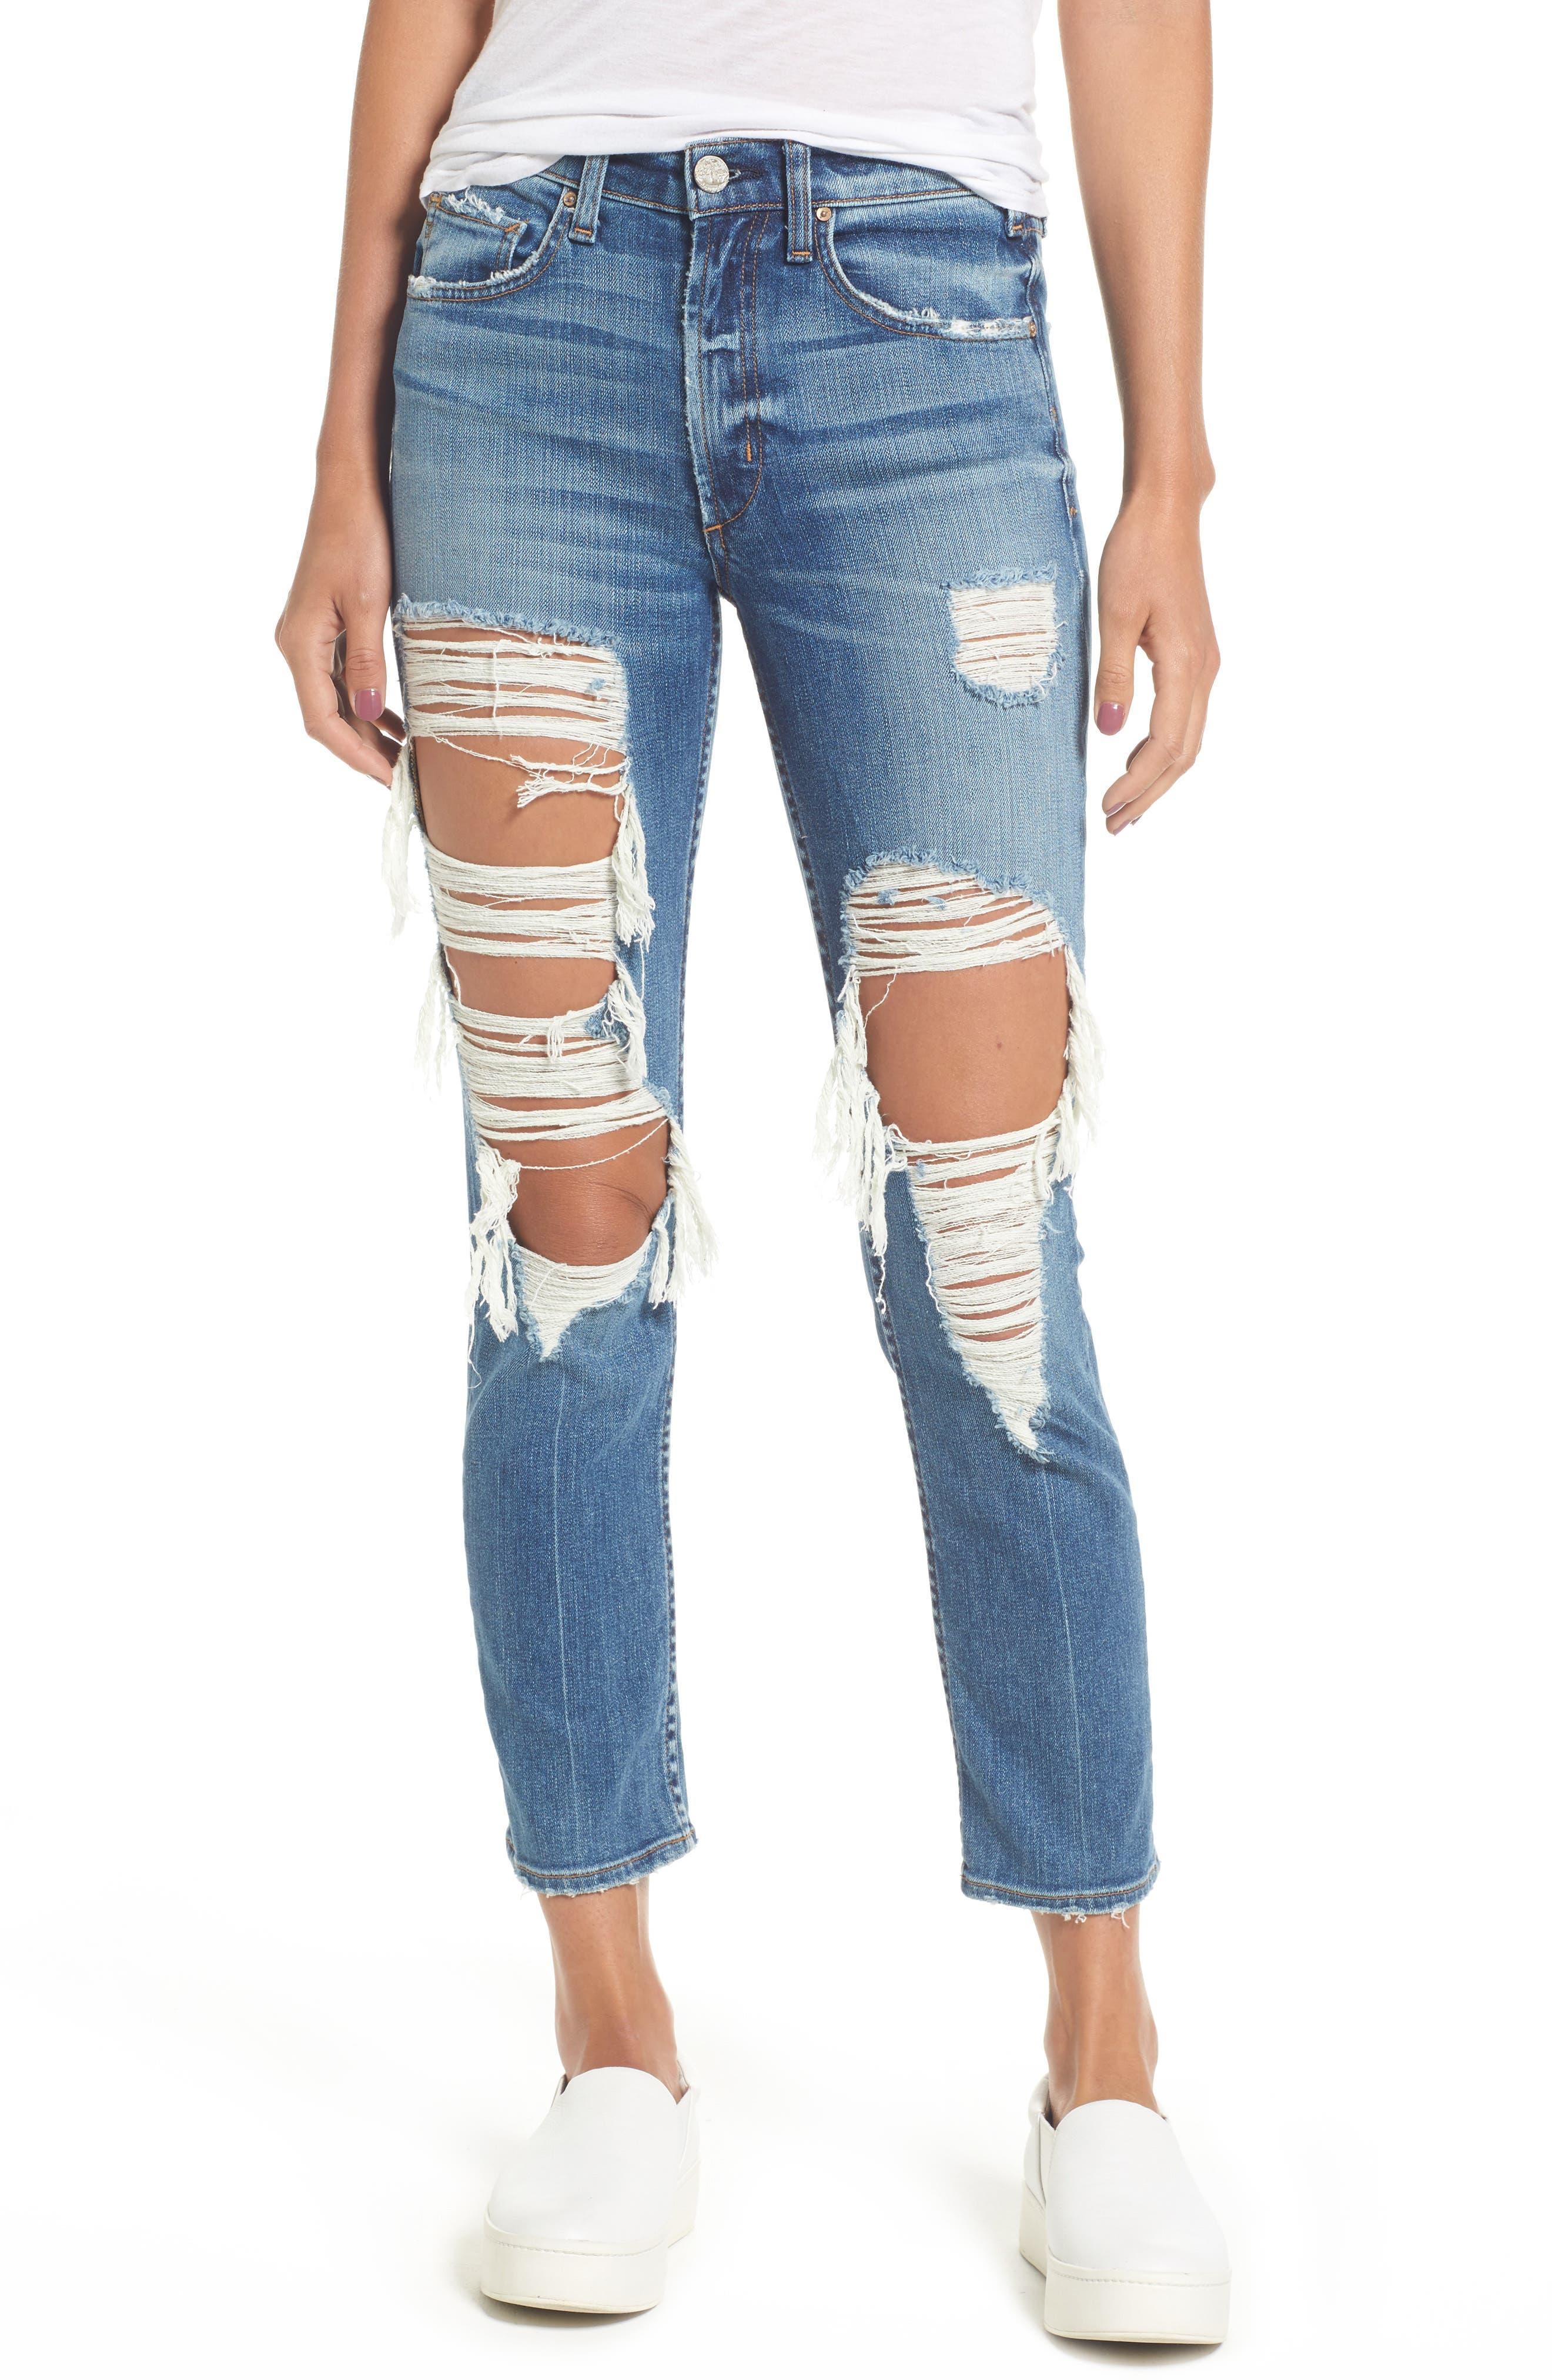 Alternate Image 1 Selected - McGuire Windsor Destroyed High Waist Straight Leg Jeans